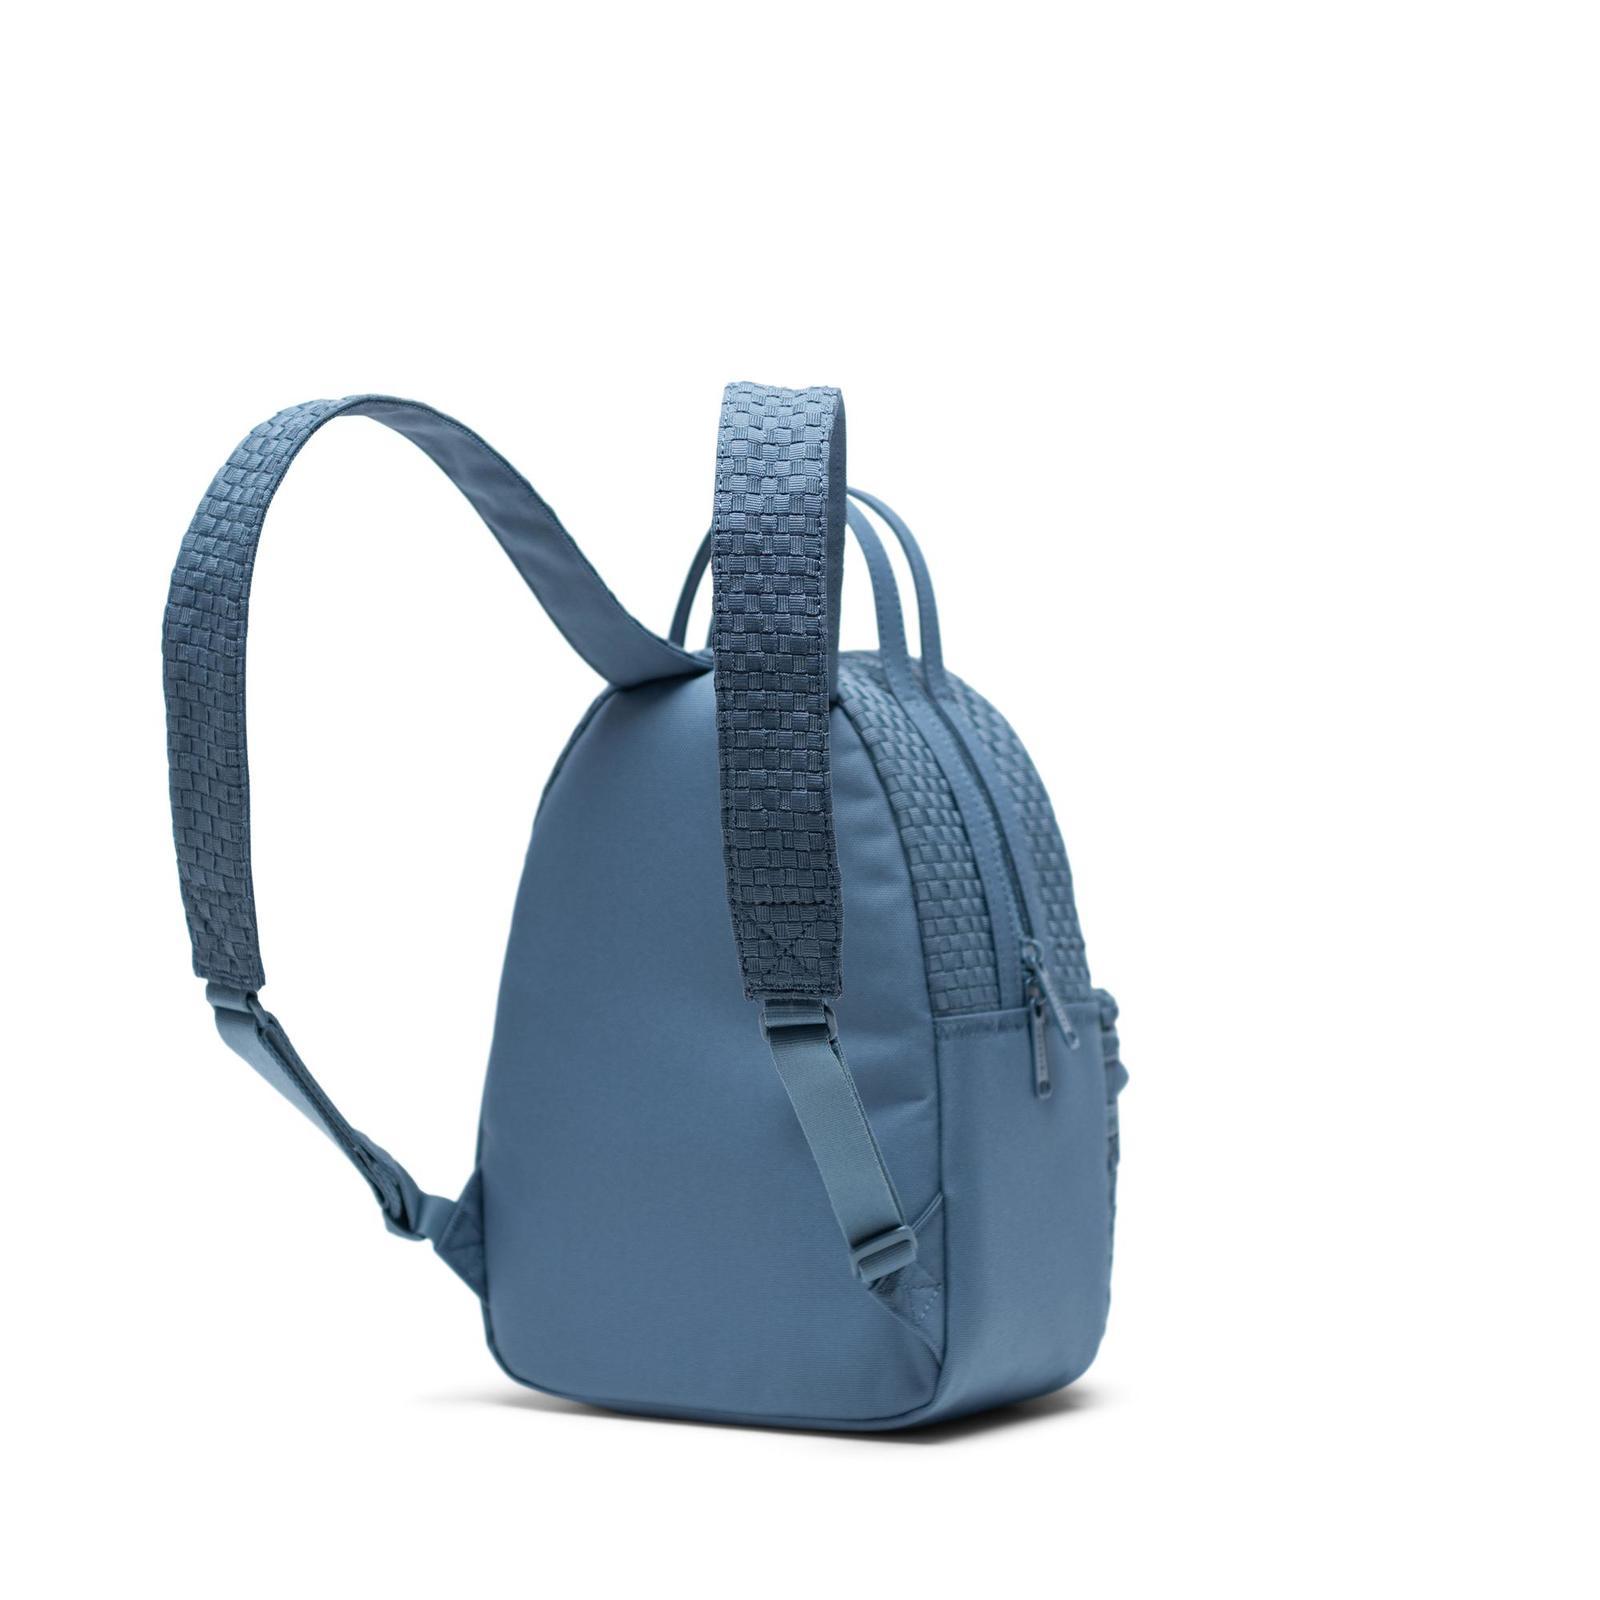 Nova Mini Backpack - Blue Mirage image